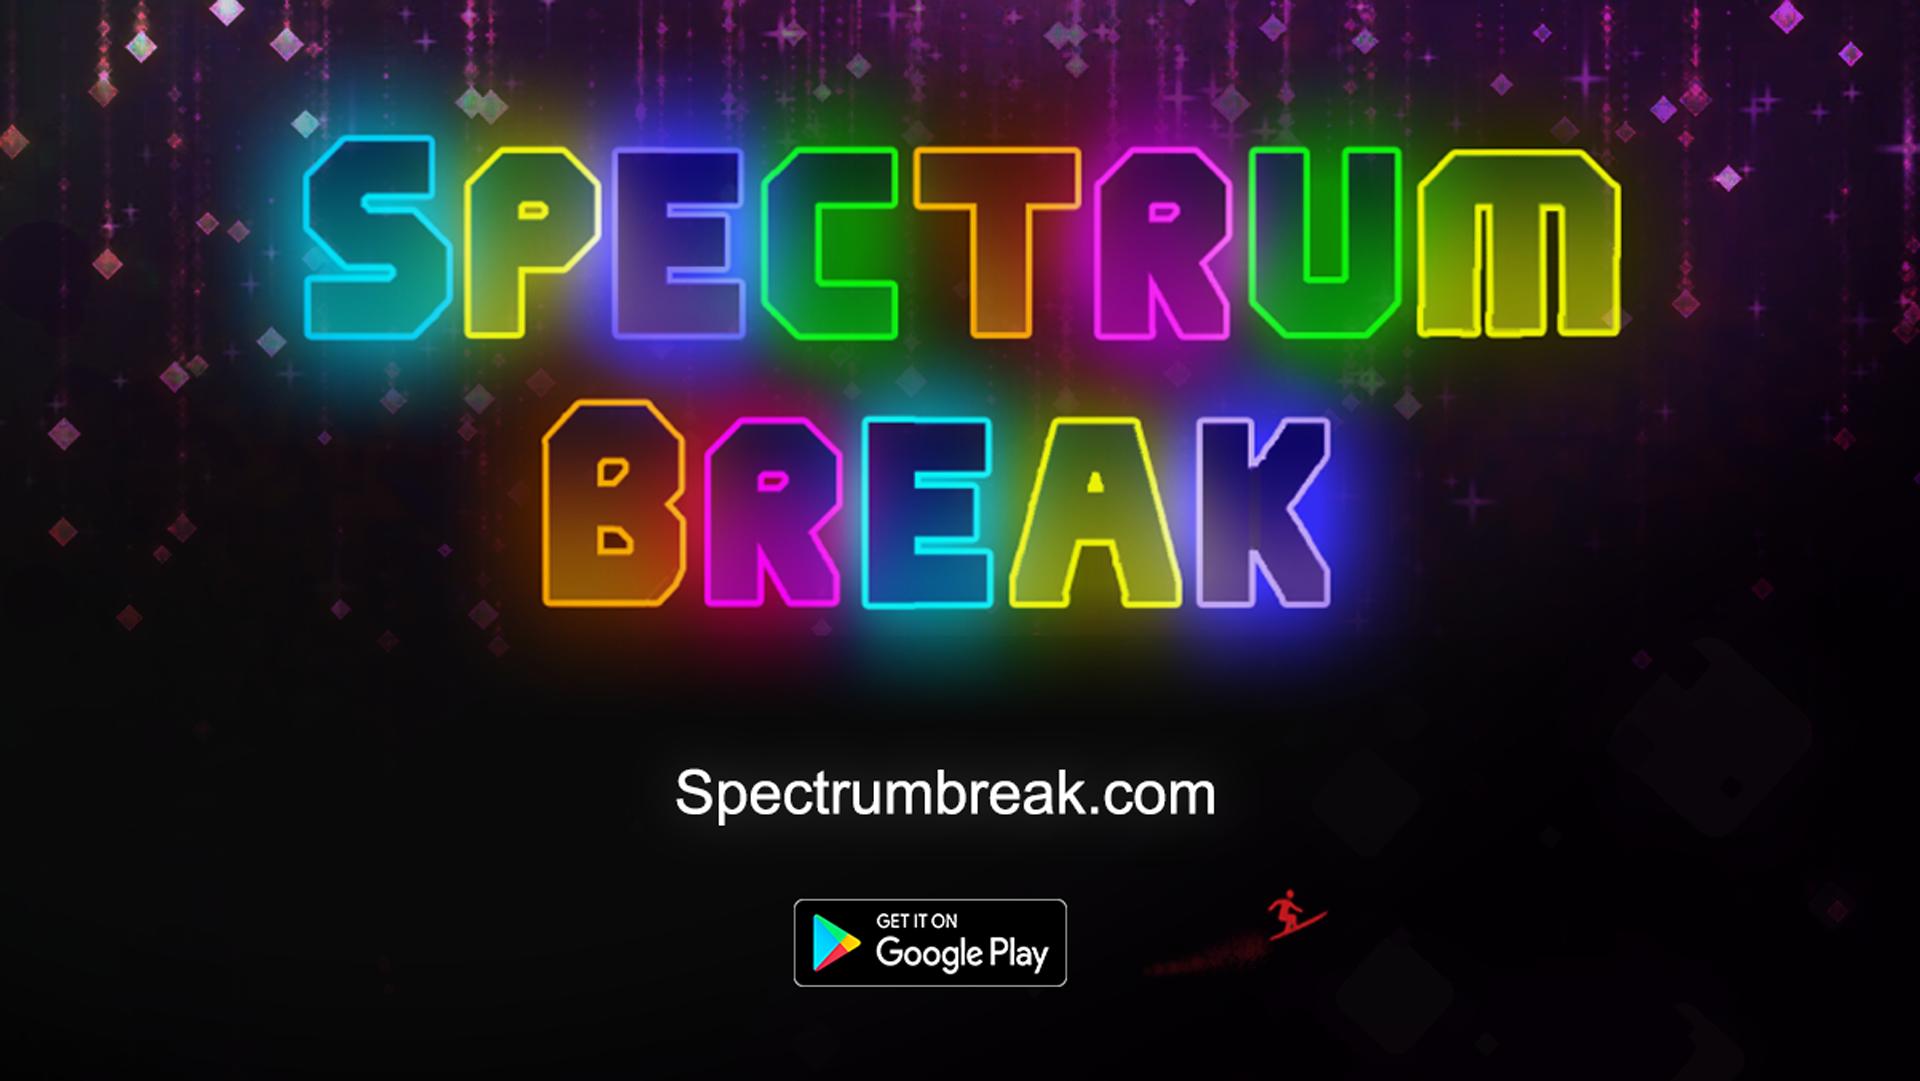 SpectrumBreakTrailerMobile.png